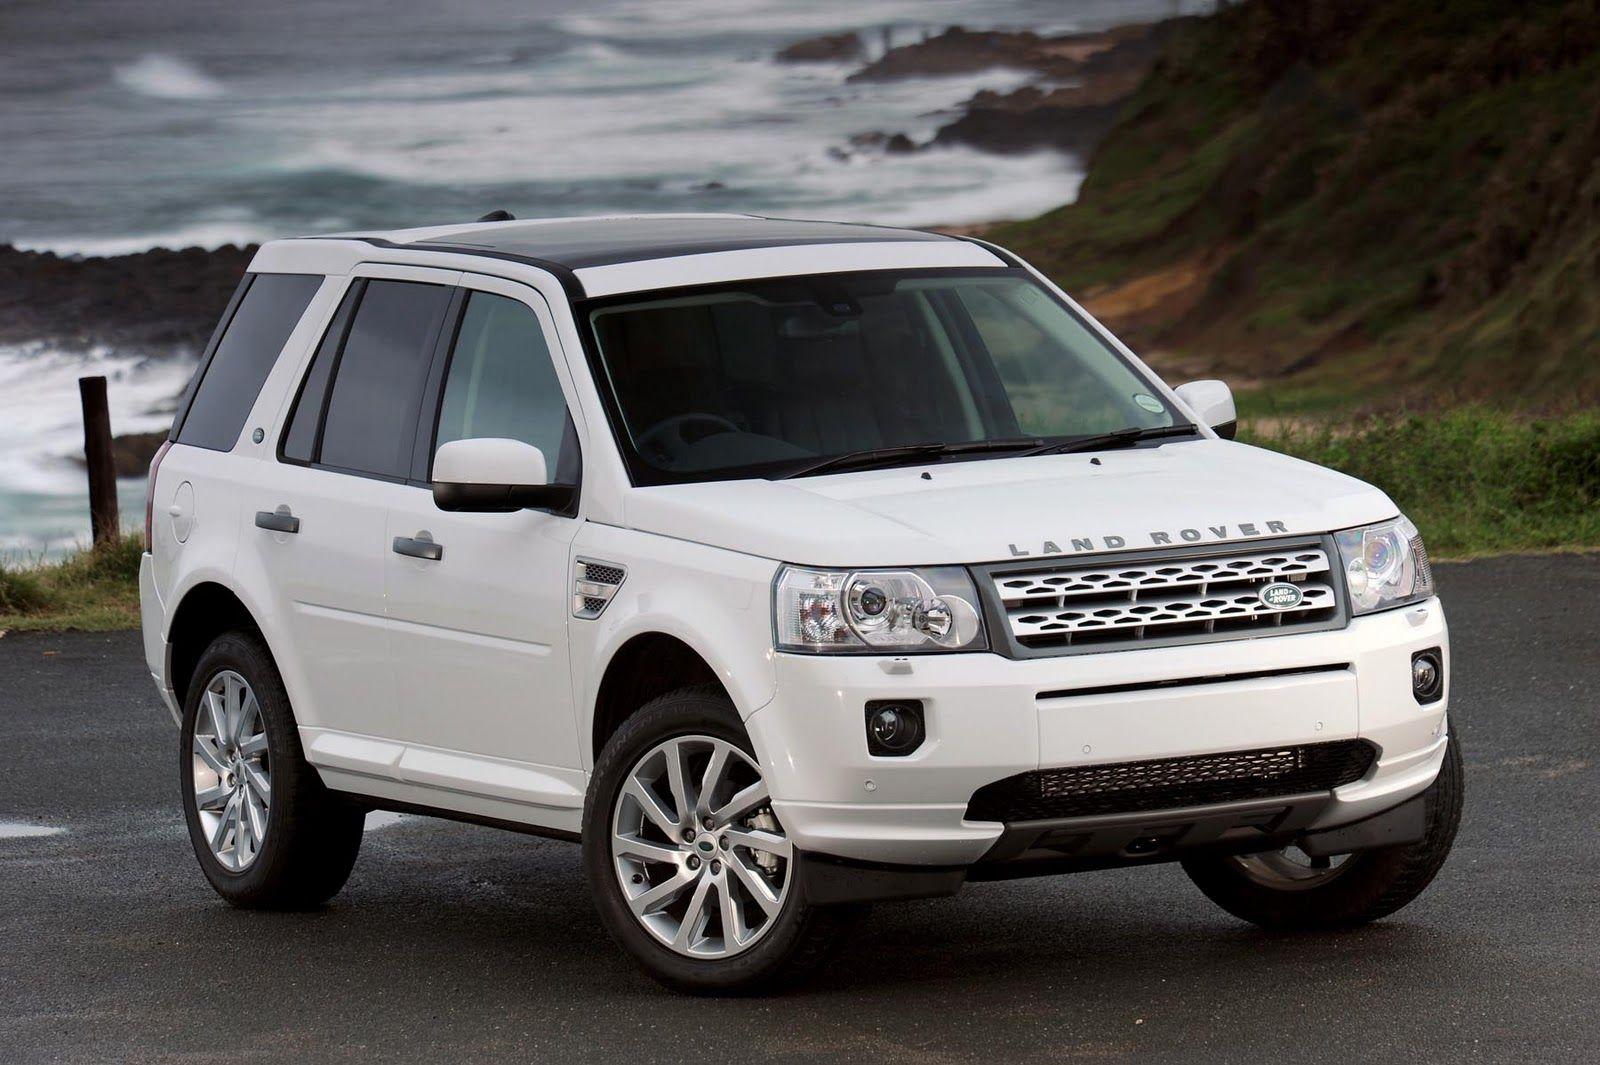 2011 Land Rover Freelander 2 | My Dream Car | Pinterest | Land rover ...